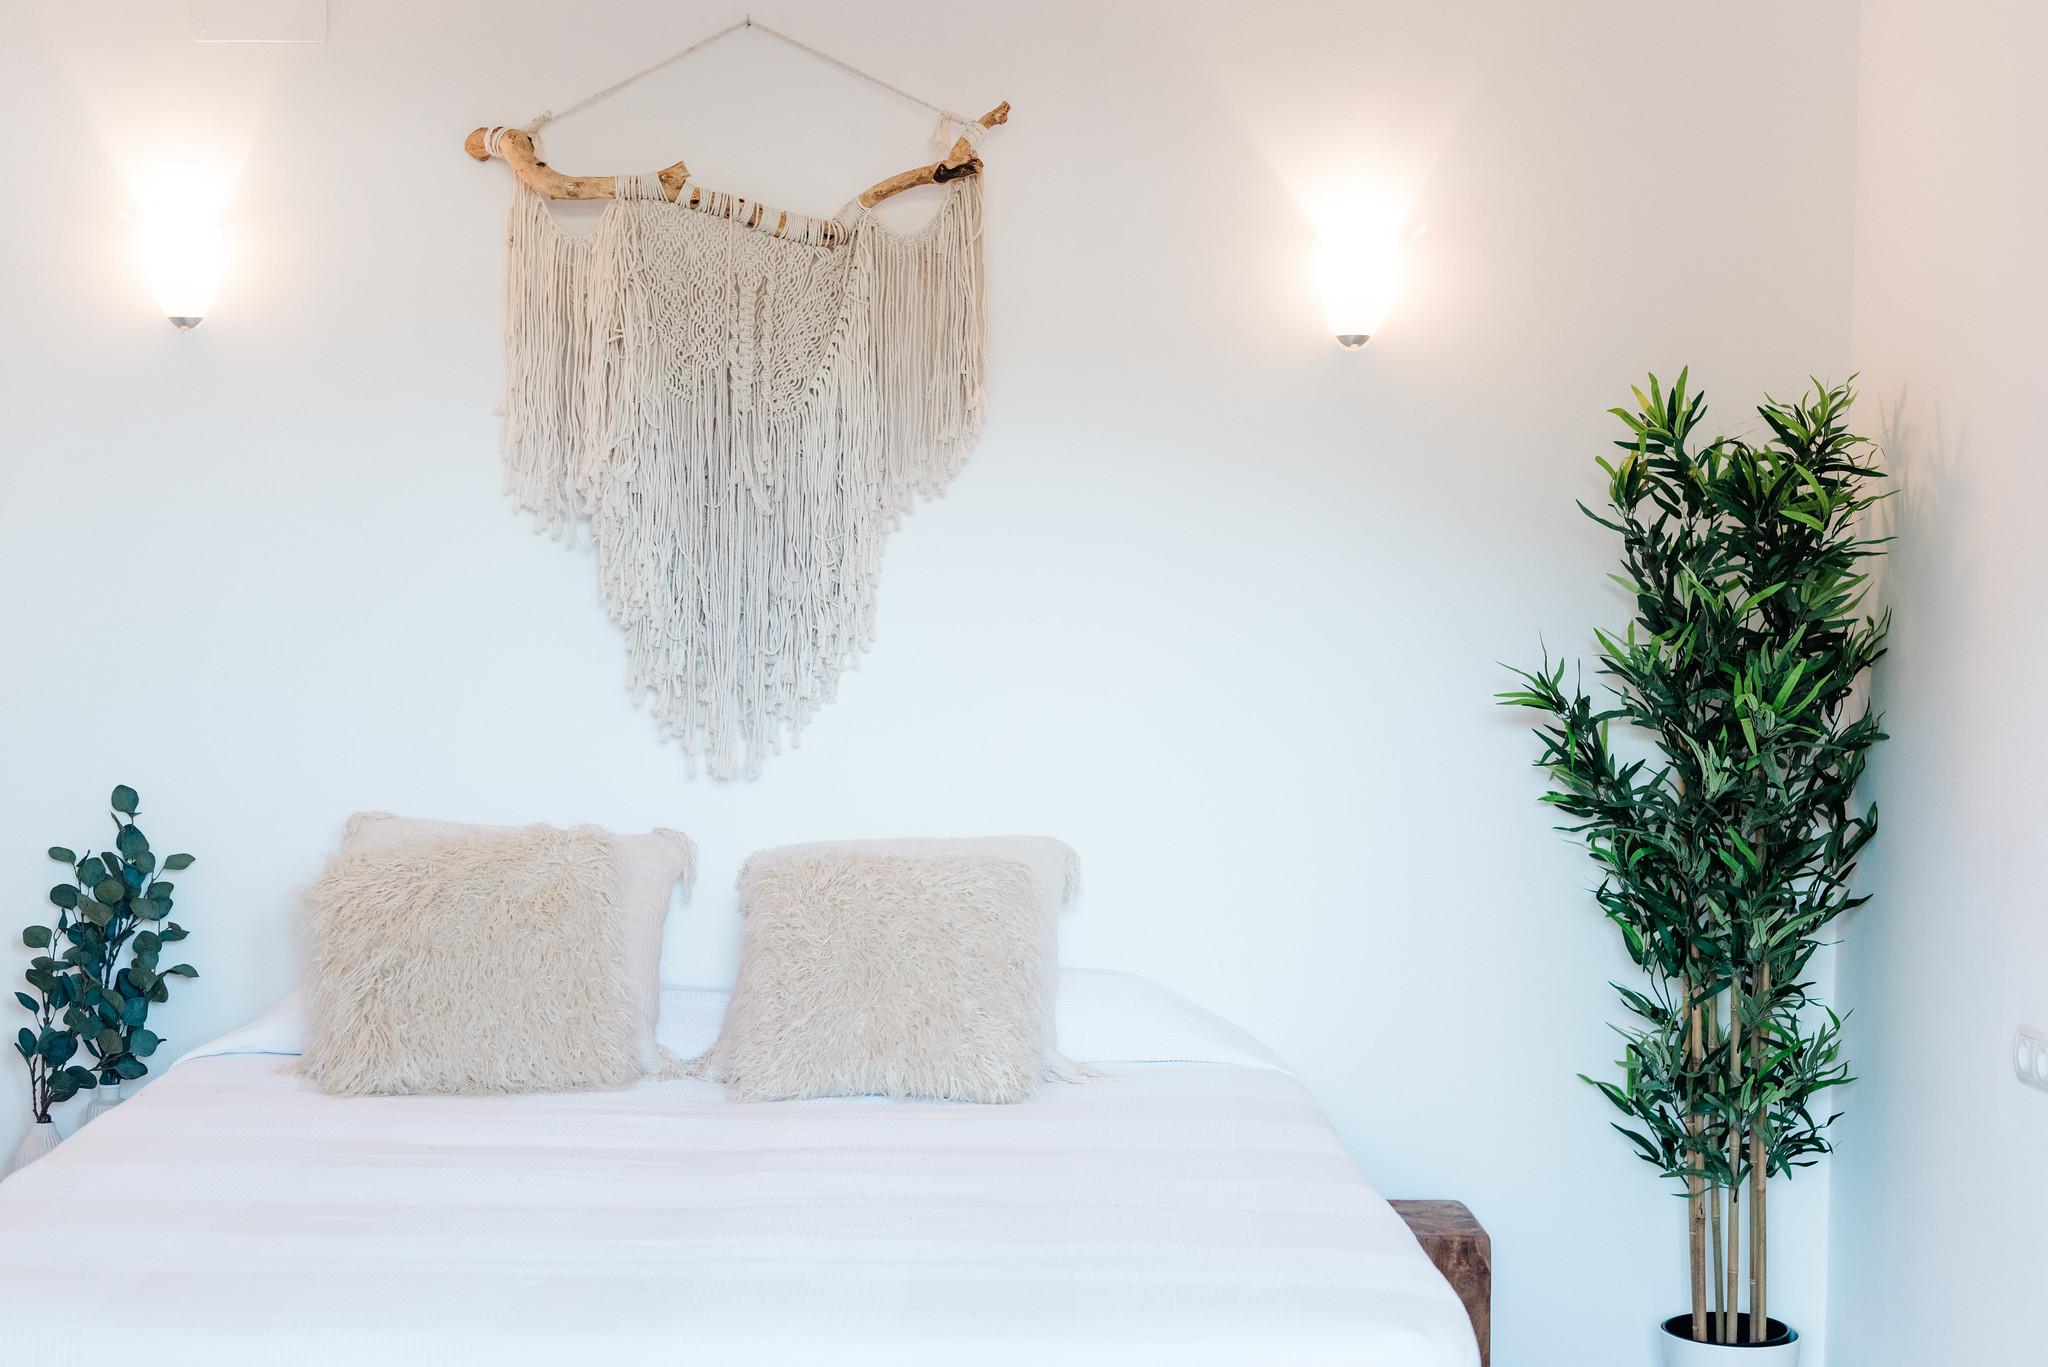 https://www.white-ibiza.com/wp-content/uploads/2020/05/white-ibiza-villas-can-verde-interior-wall-hanging.jpg